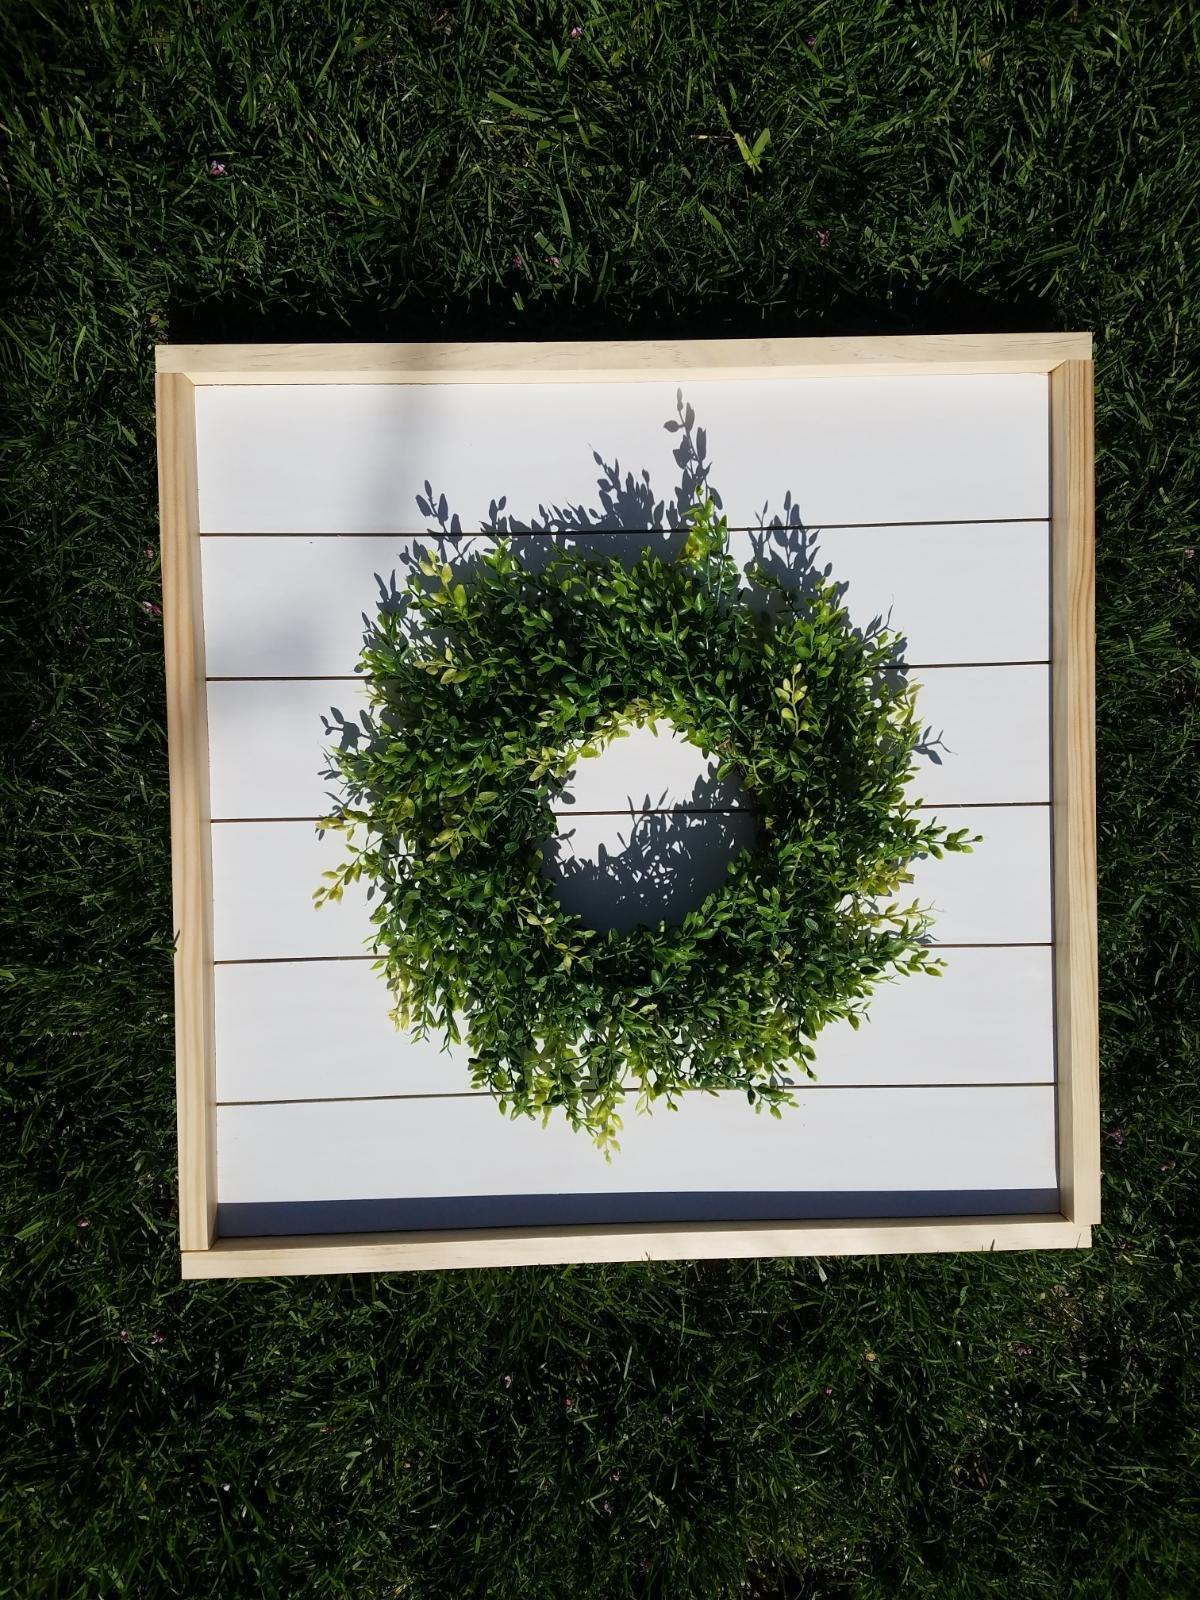 Framed Shiplap Wreath 4/26